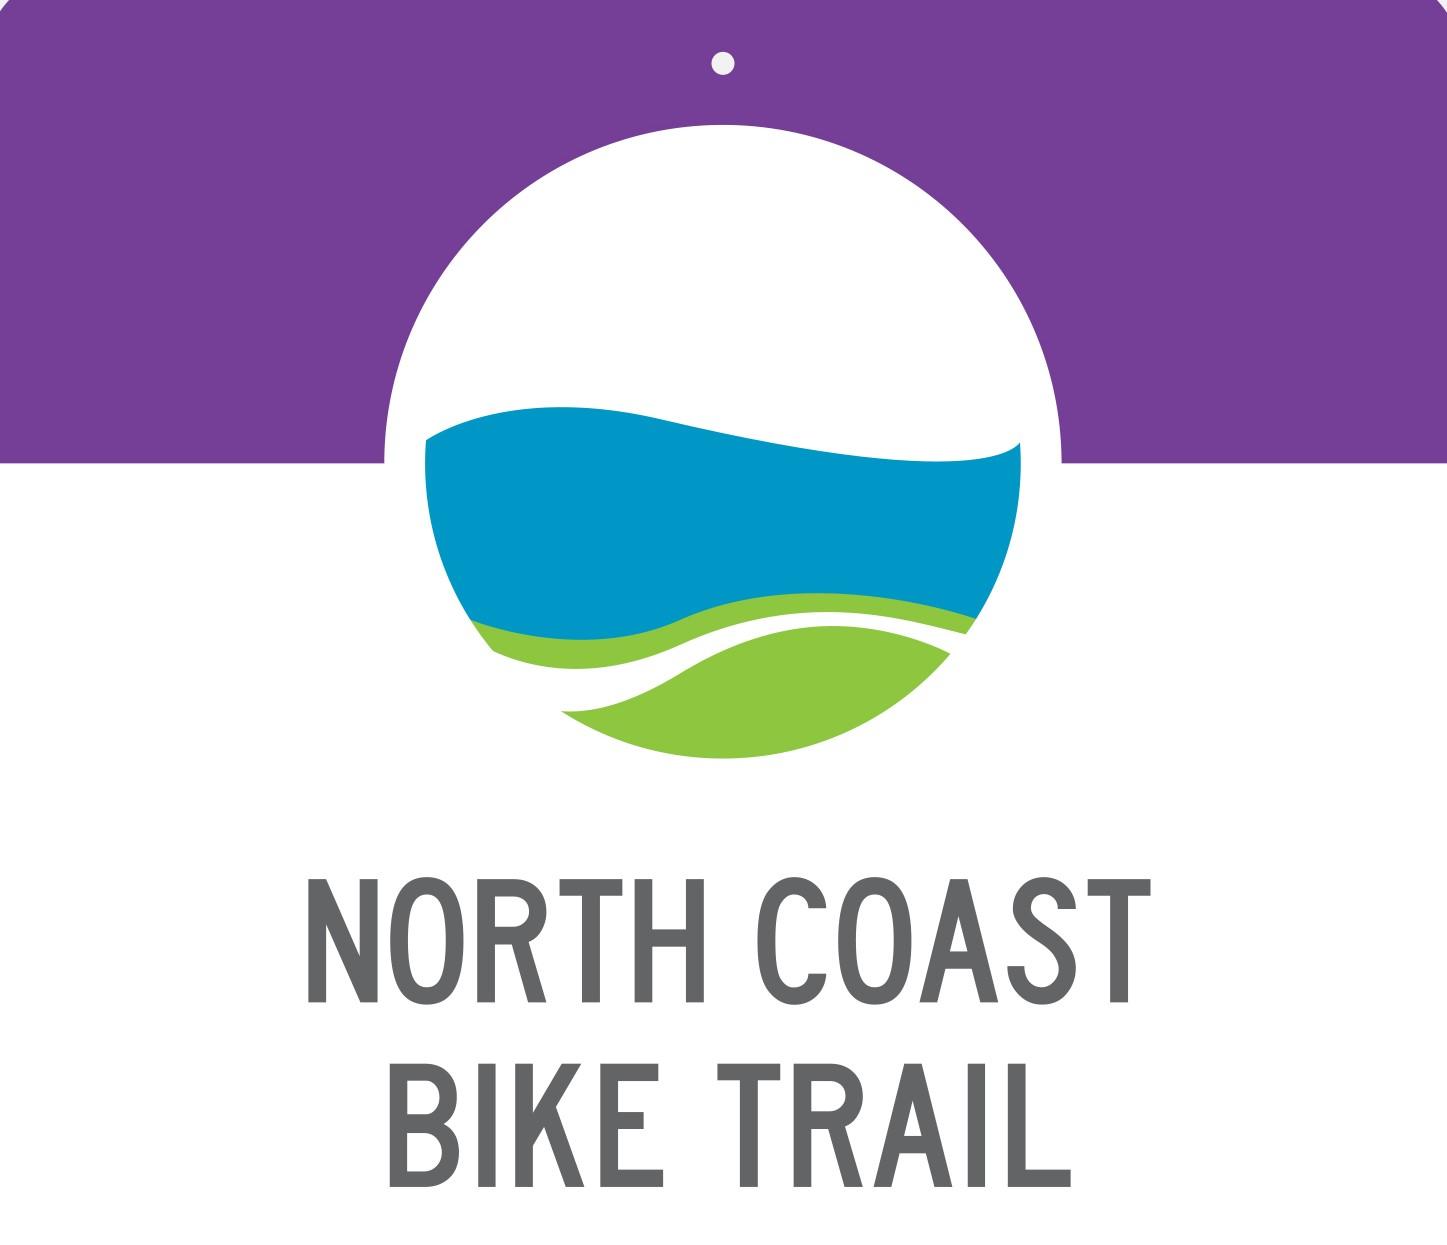 NorthCoastBikeTrail